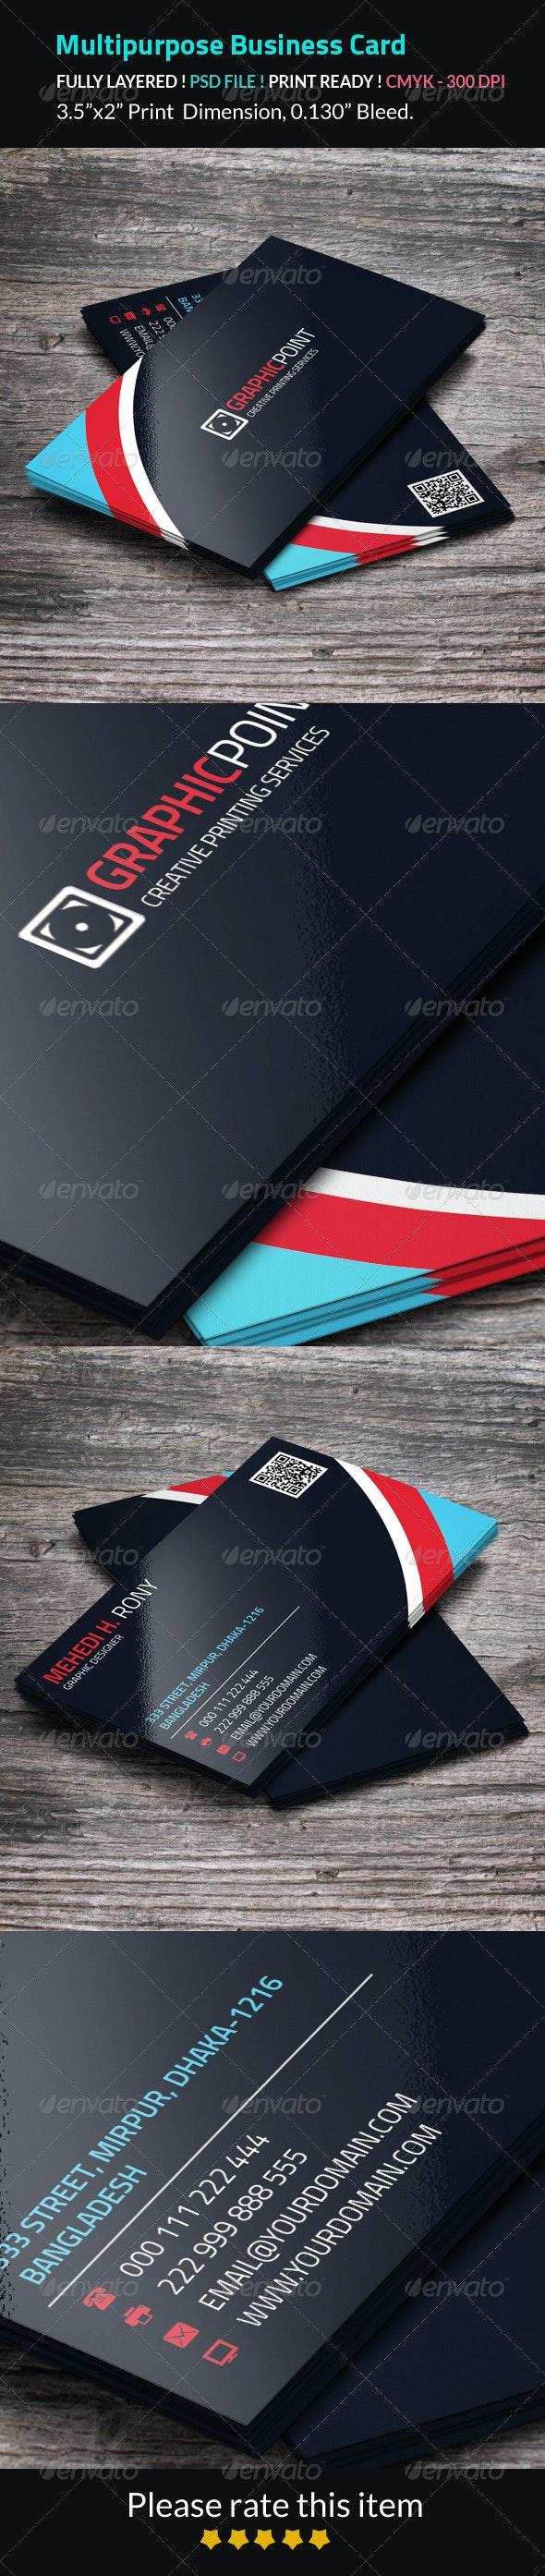 Multipurpose Business Card - Business Cards Print Templates